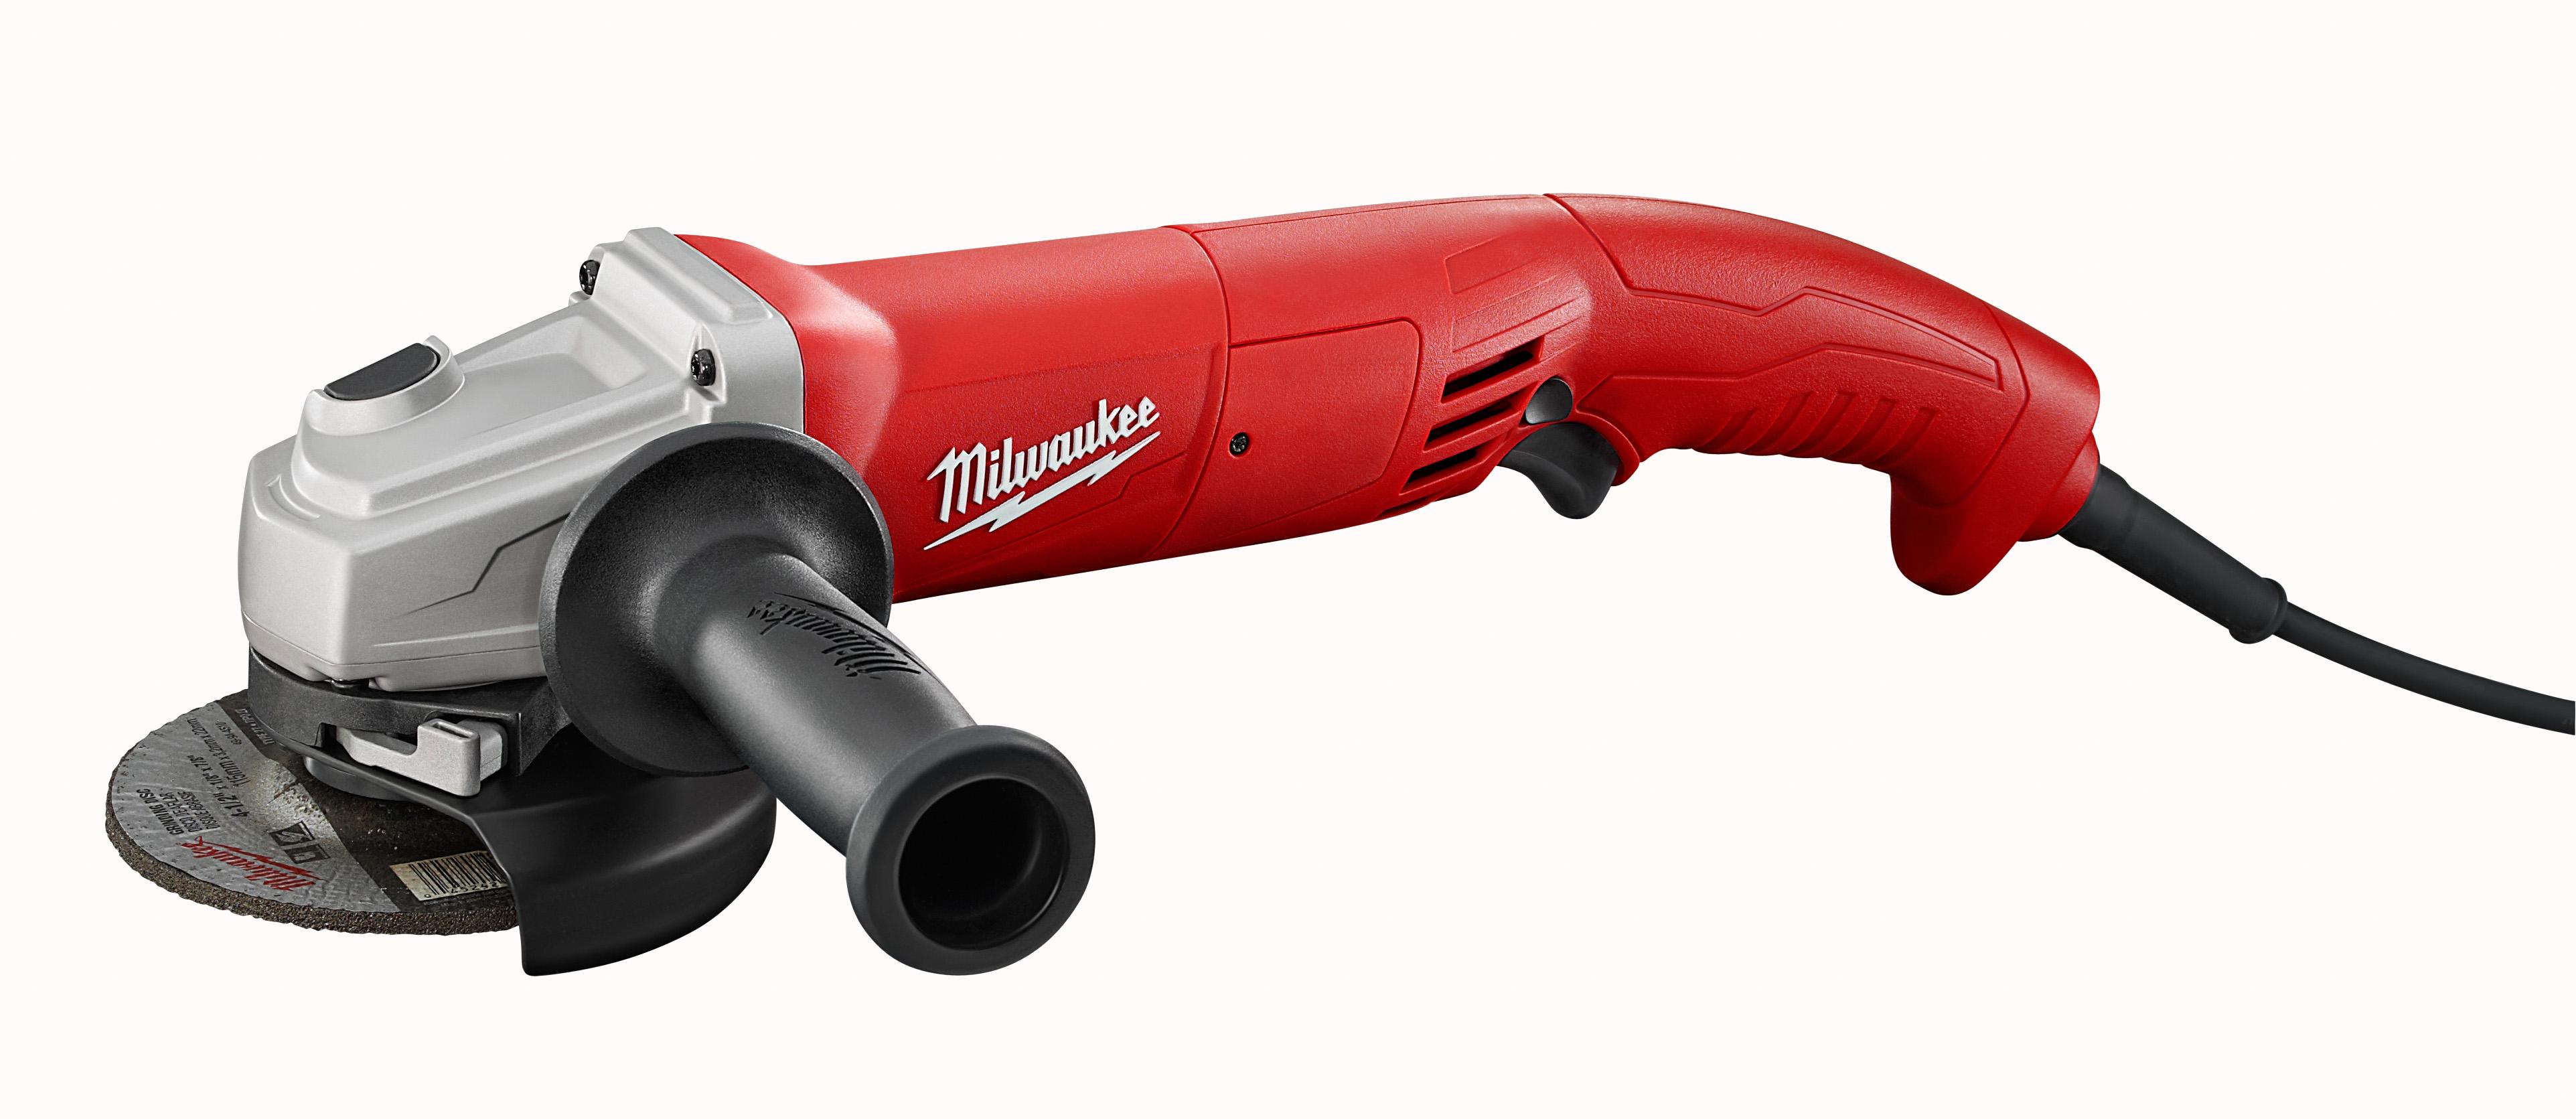 "Milwaukee 6121-31 11 Amp 4-1/2"" Small Angle Grinder Trigger Grip, No-Lock"